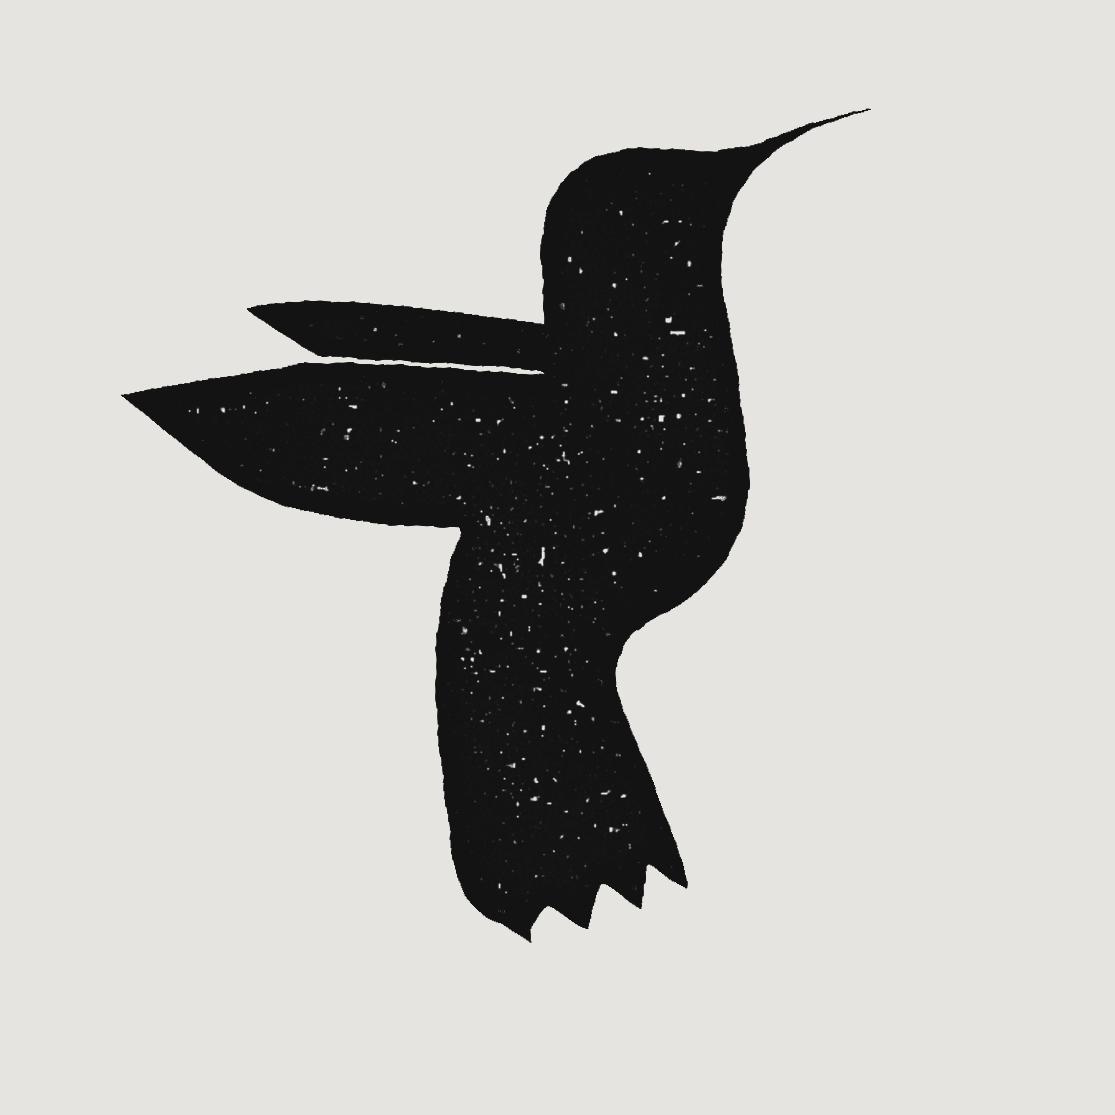 zumbar_Hummingbird_BG3.jpg